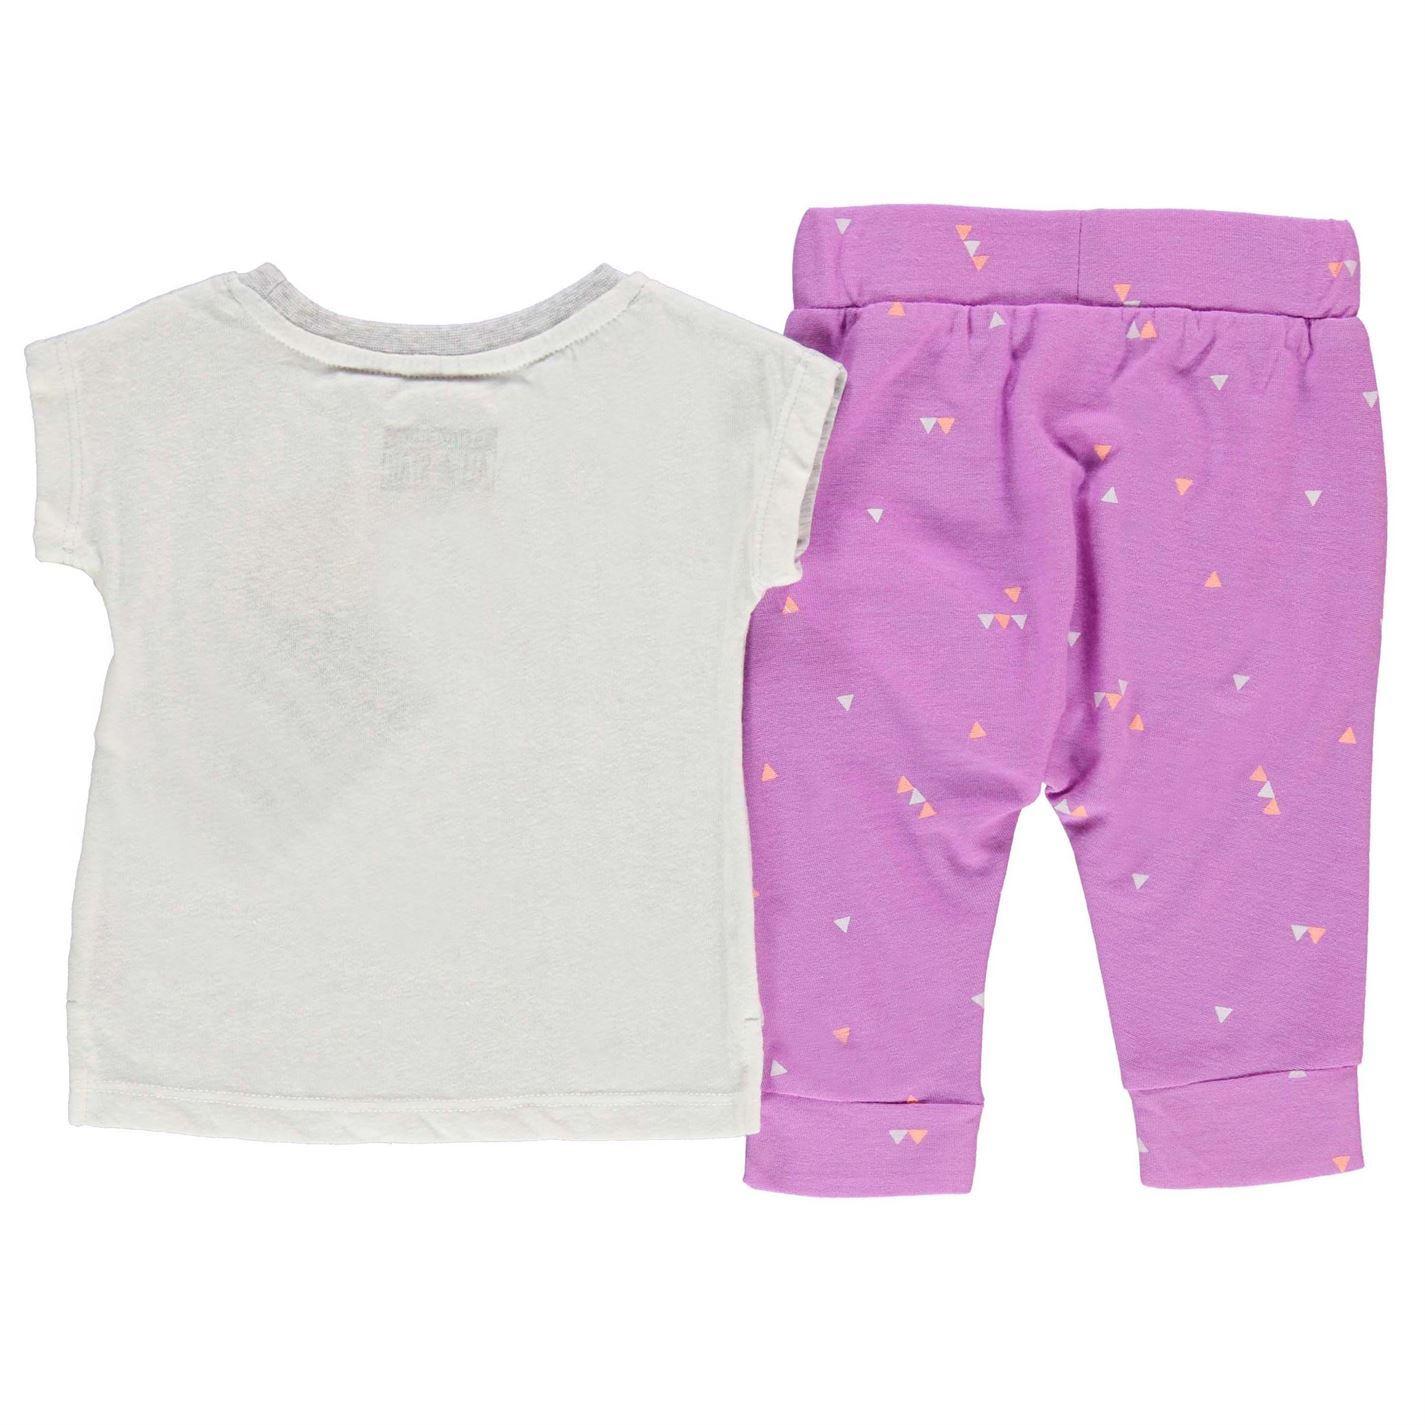 Converse 2 Piece T Shirt Shorts Set Infant Baby Pink Grey Clothes